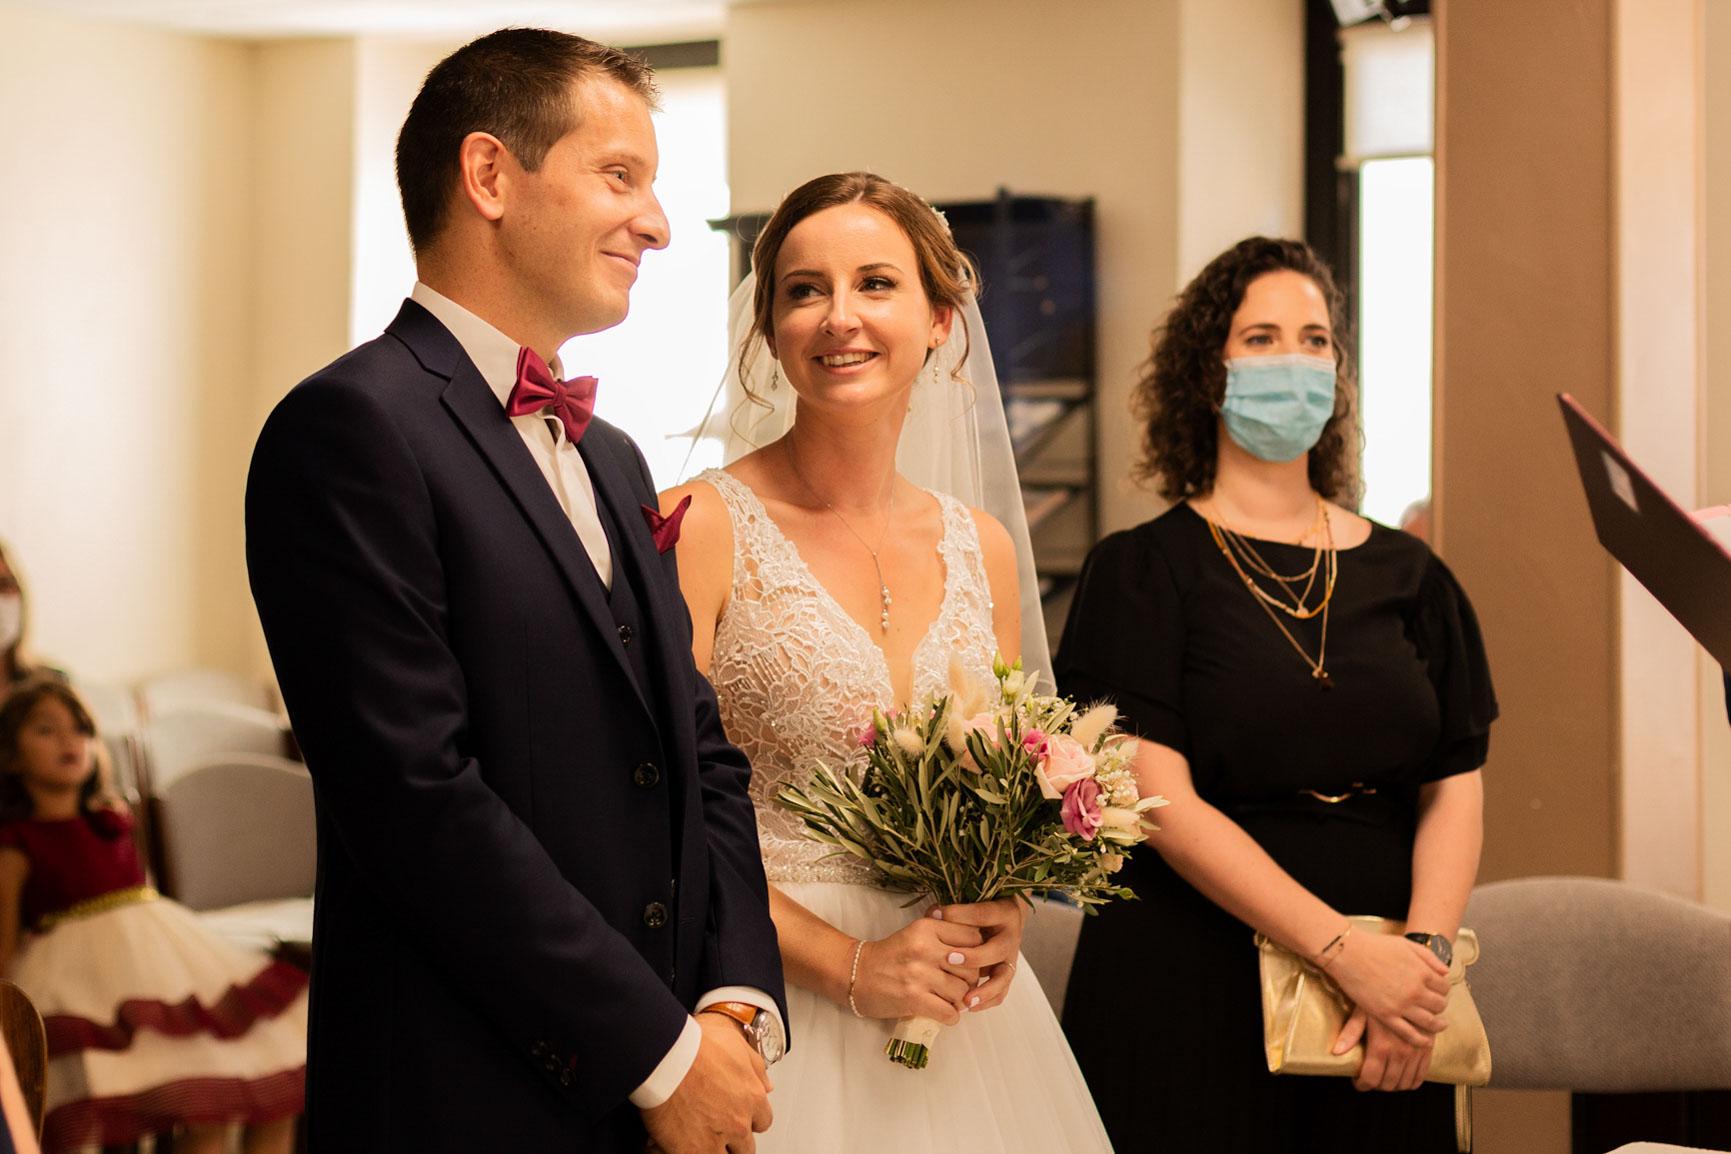 Couple Mariage La Fare-Les-Oliviers | Justine Maquart Photographe